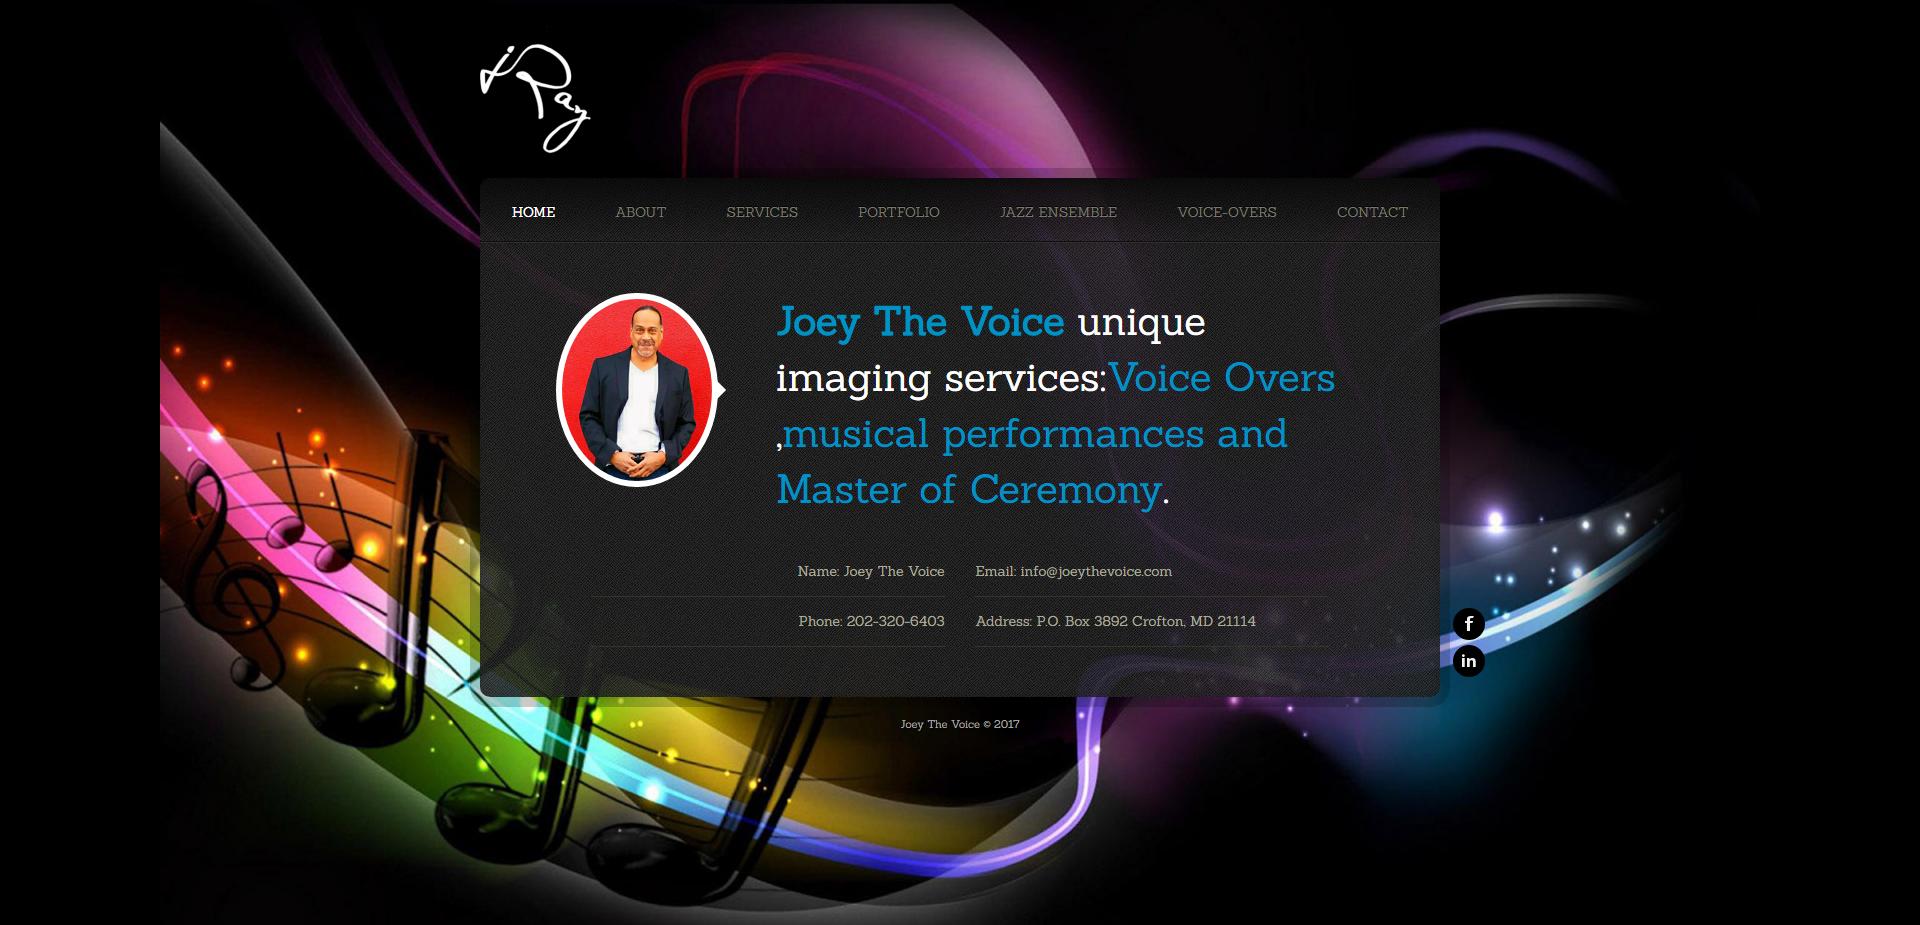 Joey The Voice